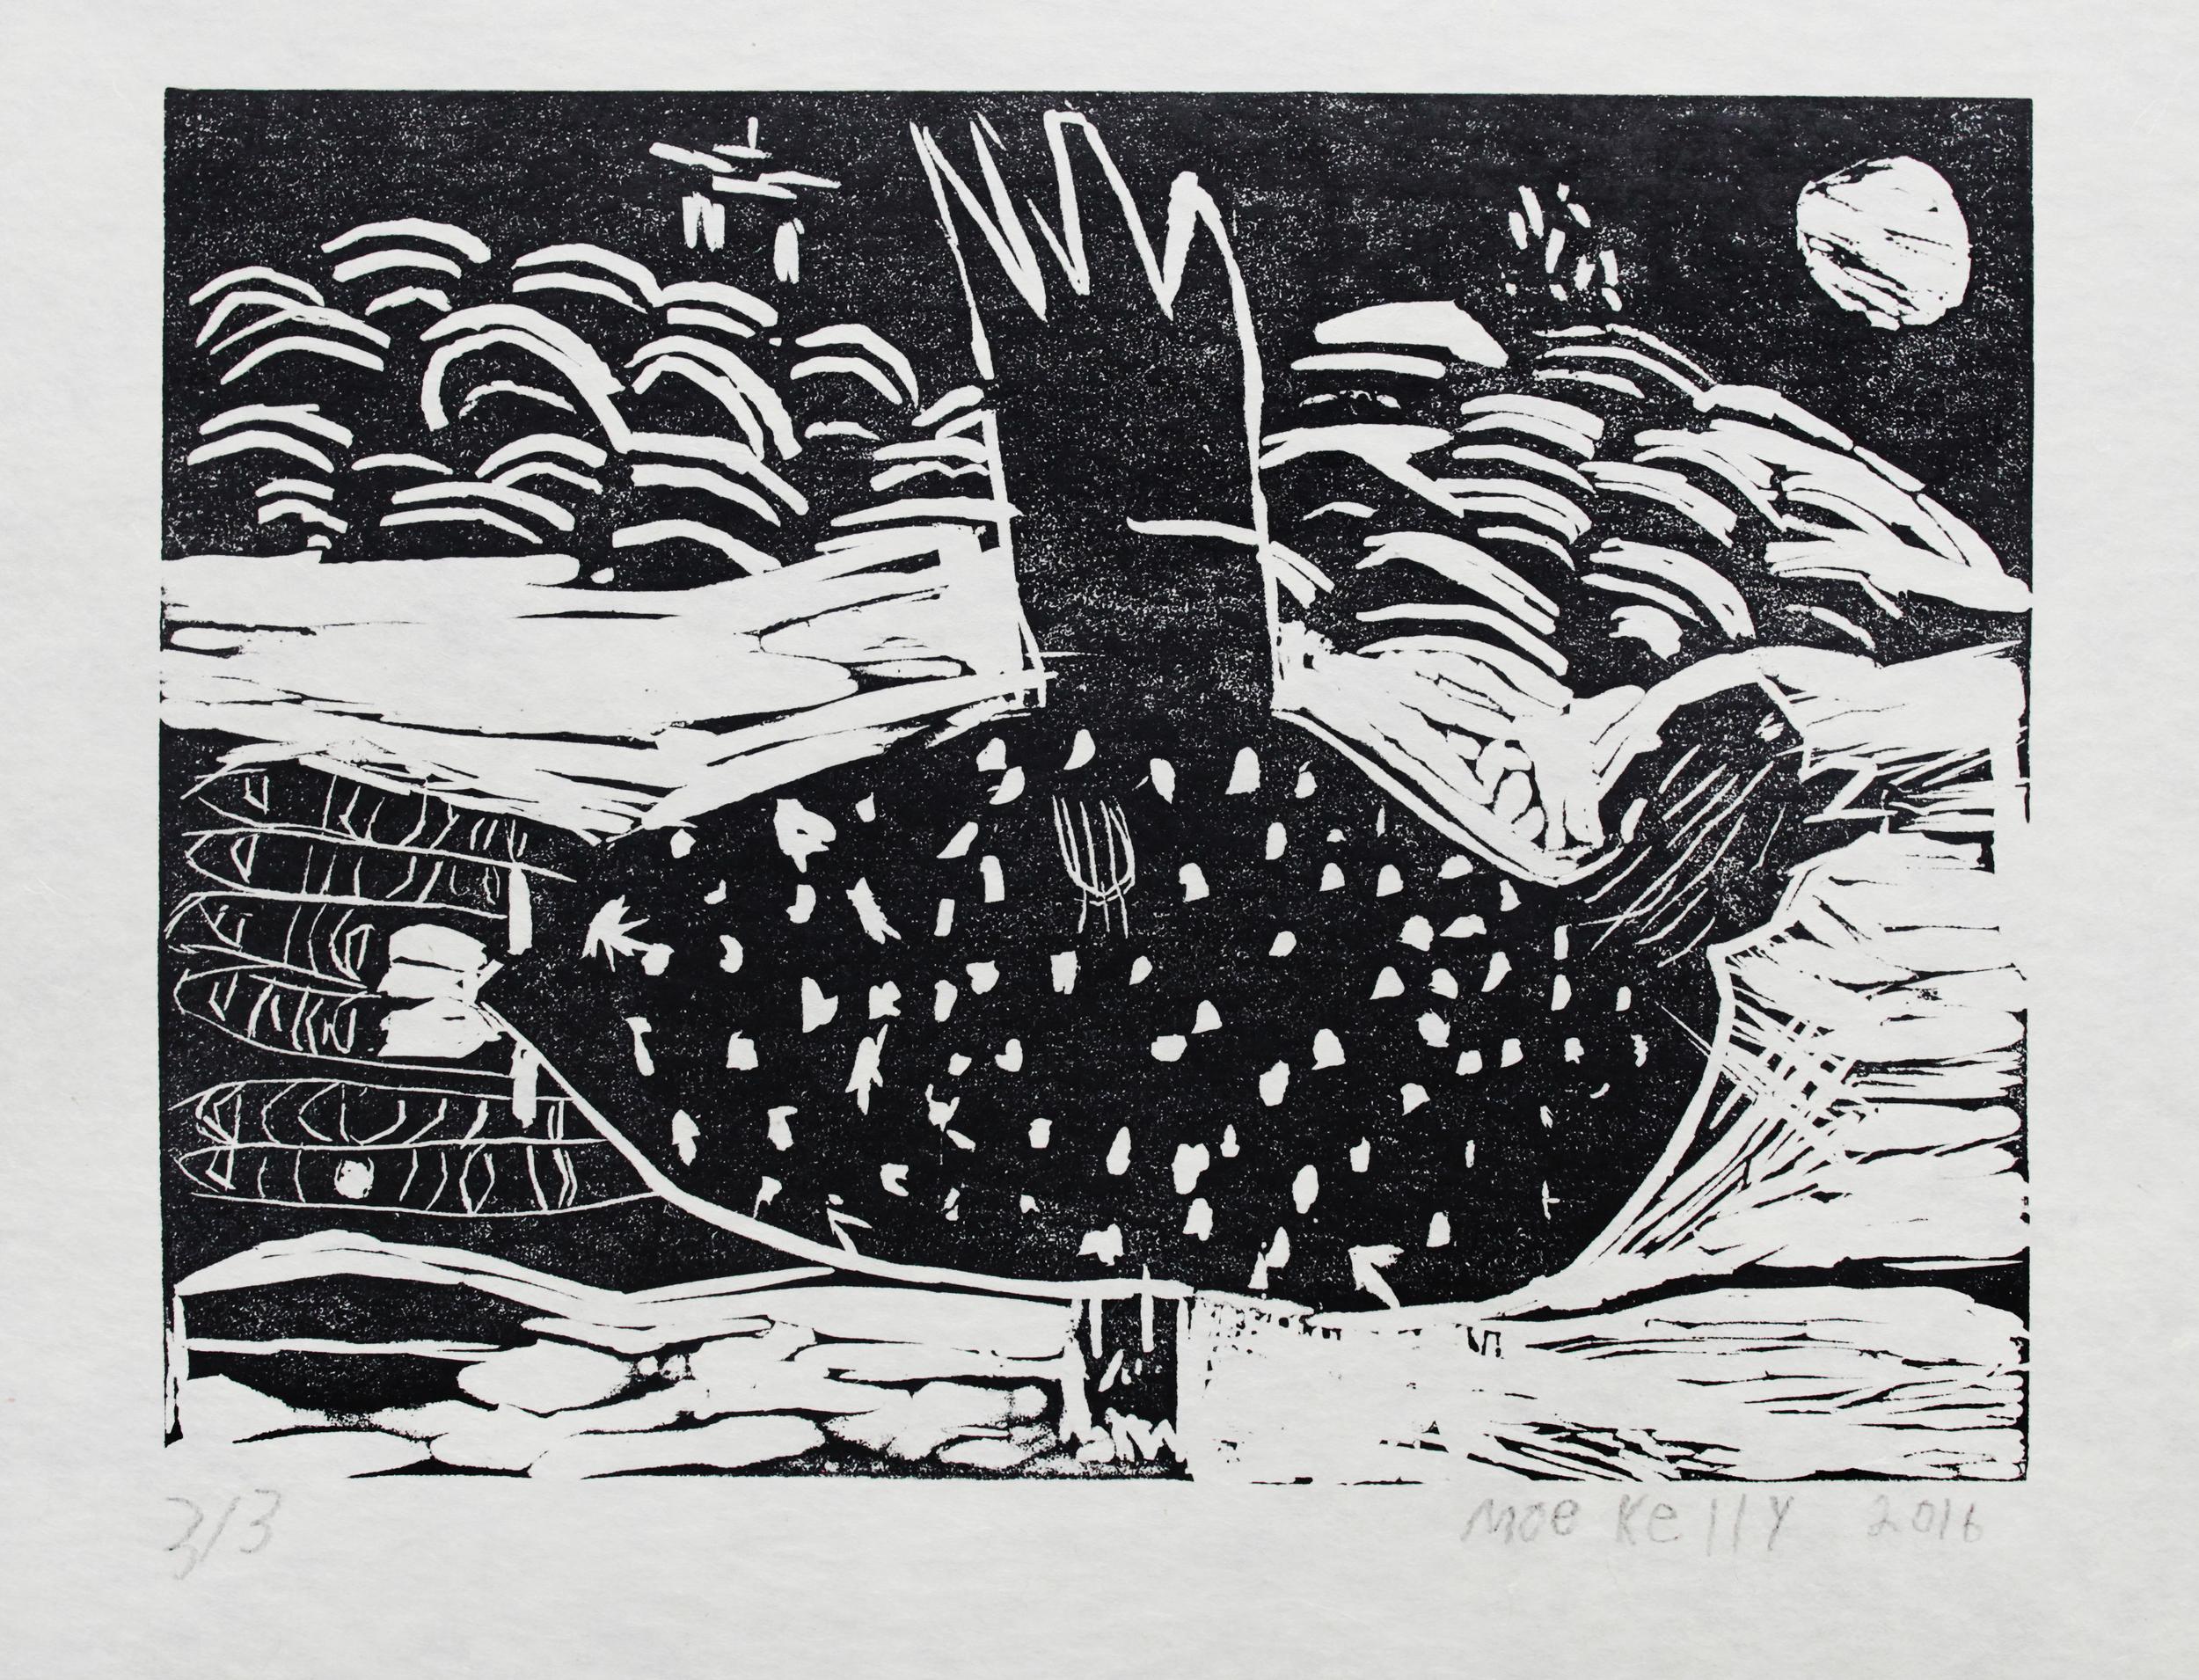 "Untitled   Moe Kelly  One-Layer Linocut Print on Washi  15.5 x 21.5"""